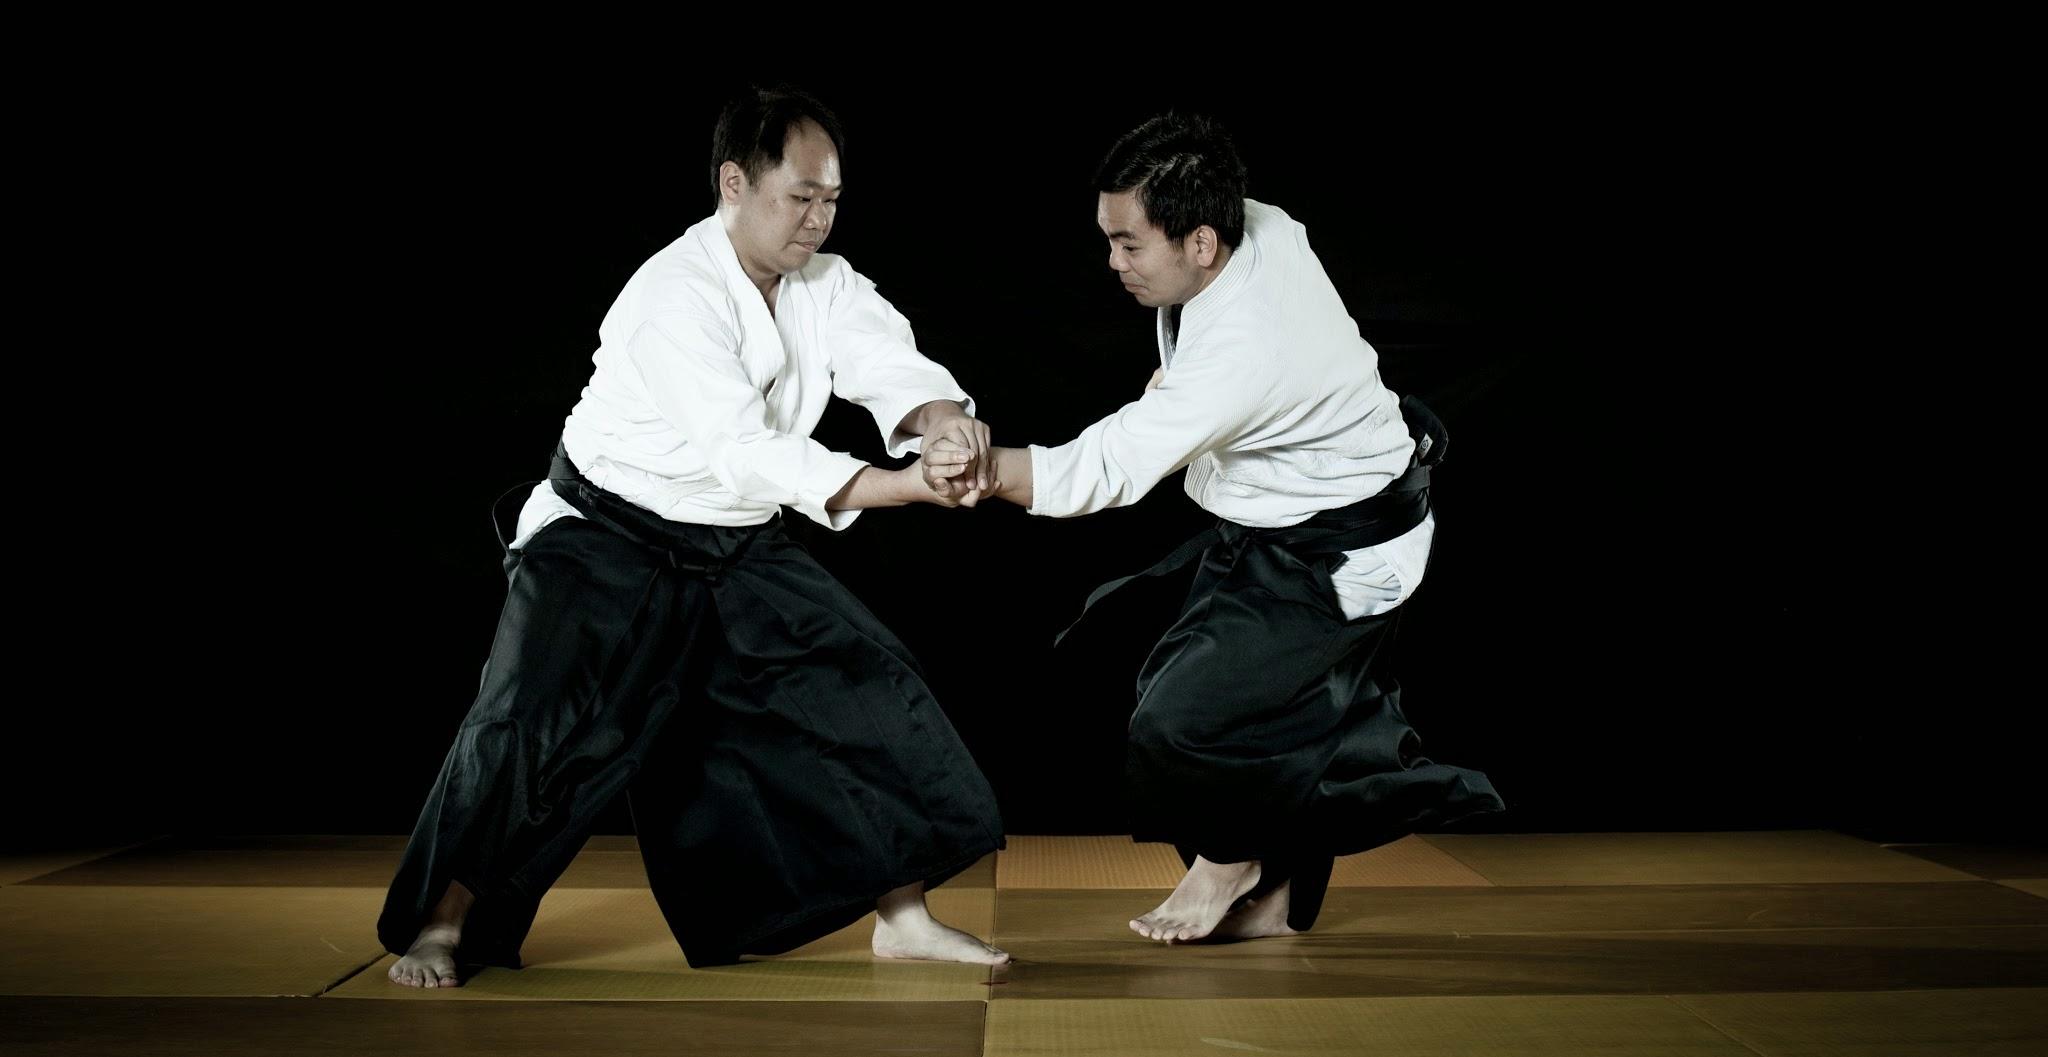 Aikido_Mar_2014-421.jpg